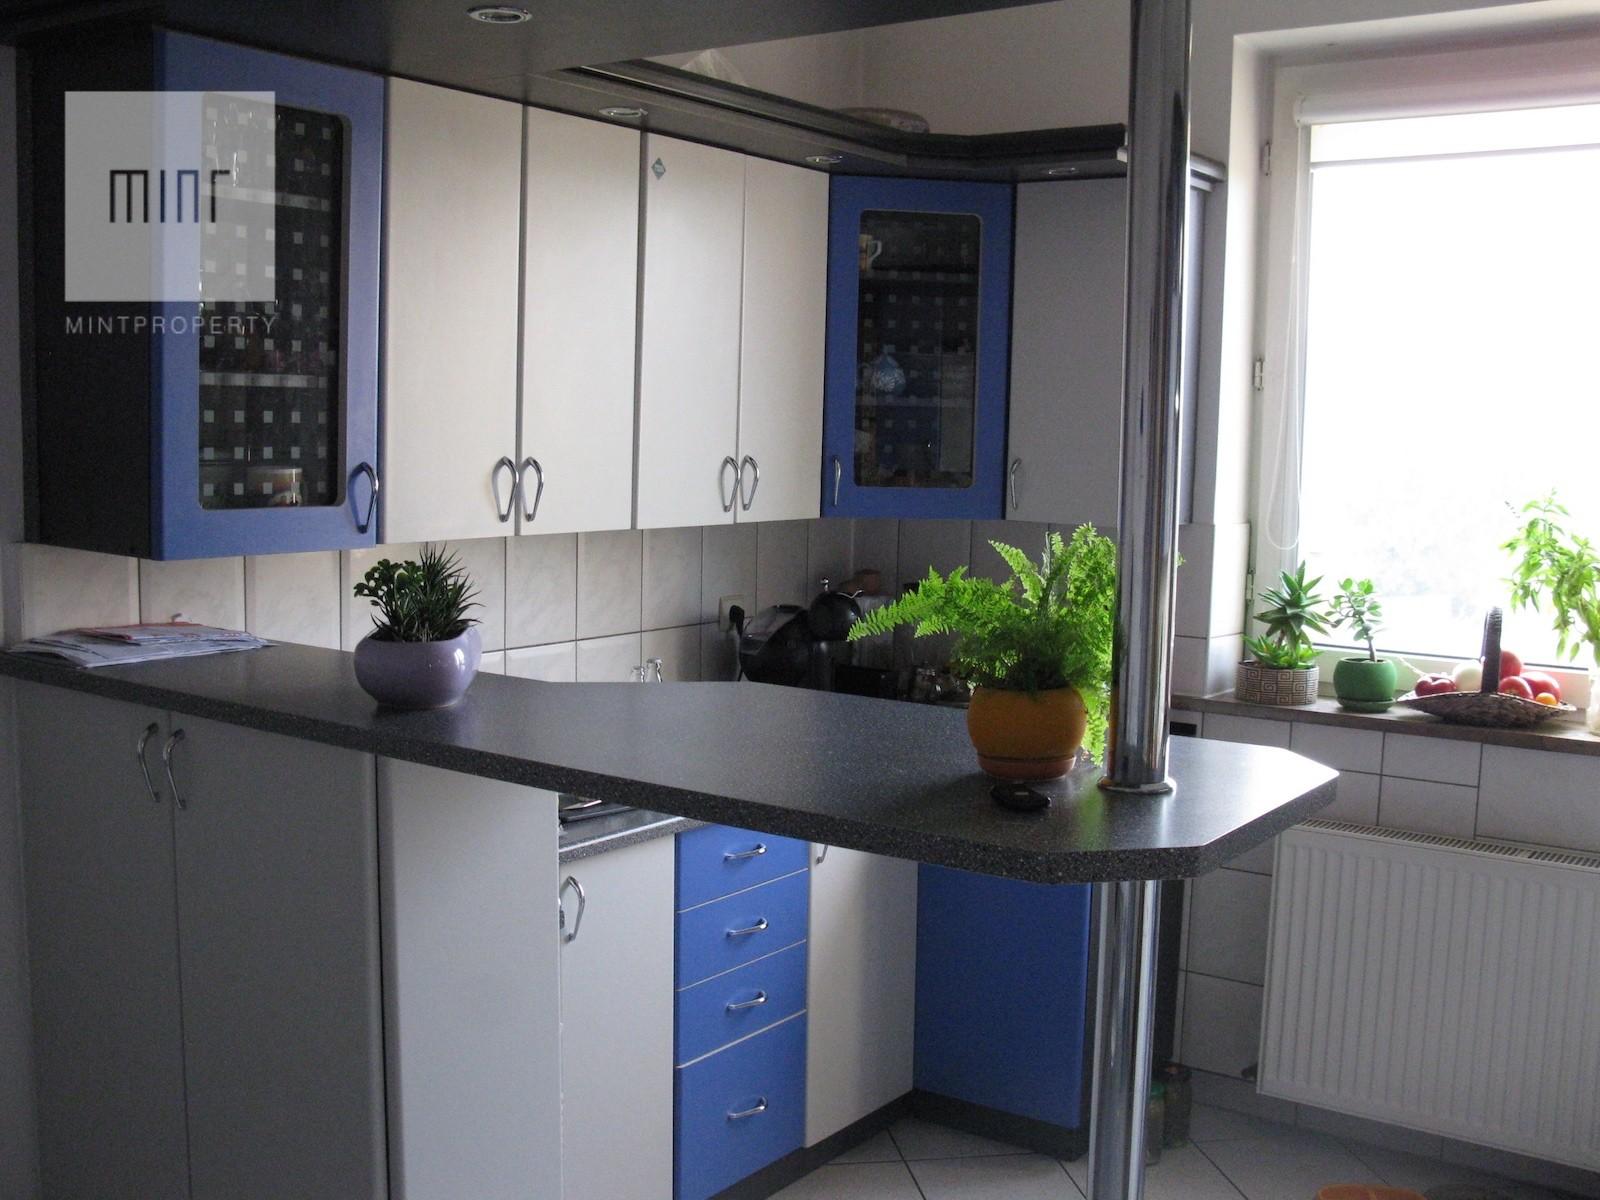 Dbica house sale ul Tysiclecia   MINT Property 1600x1200